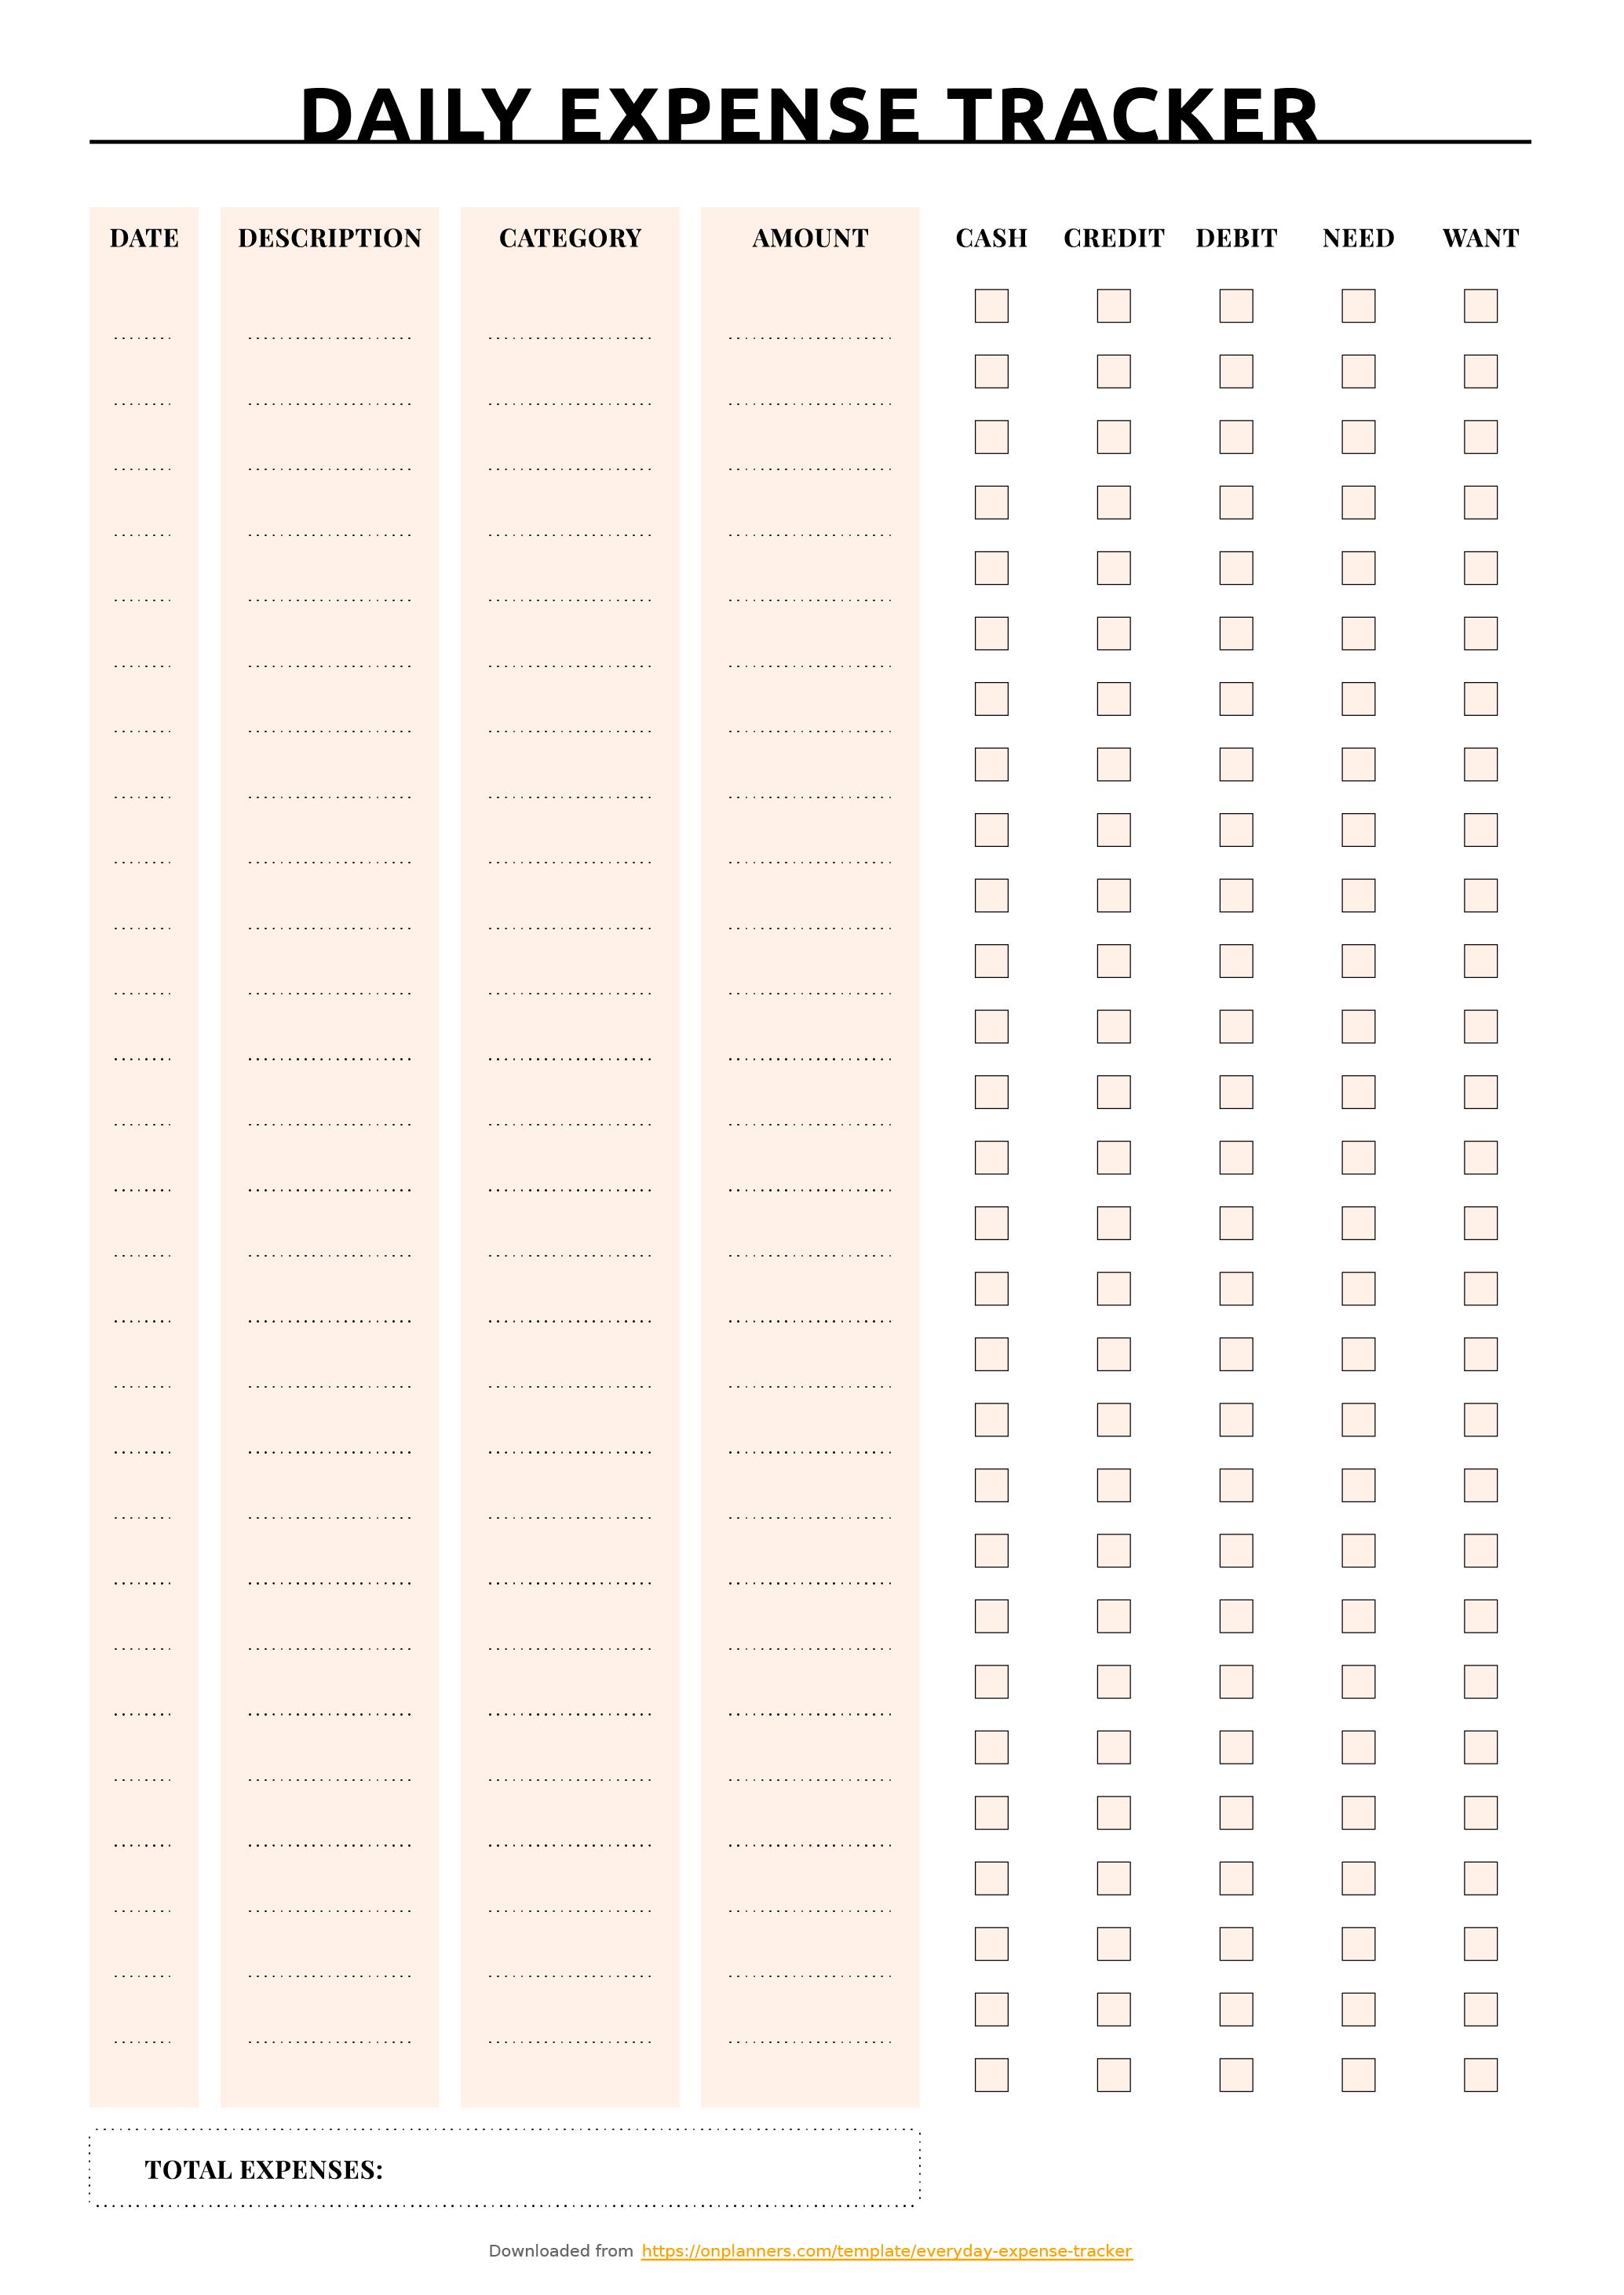 Free Printable Daily Expense Tracker